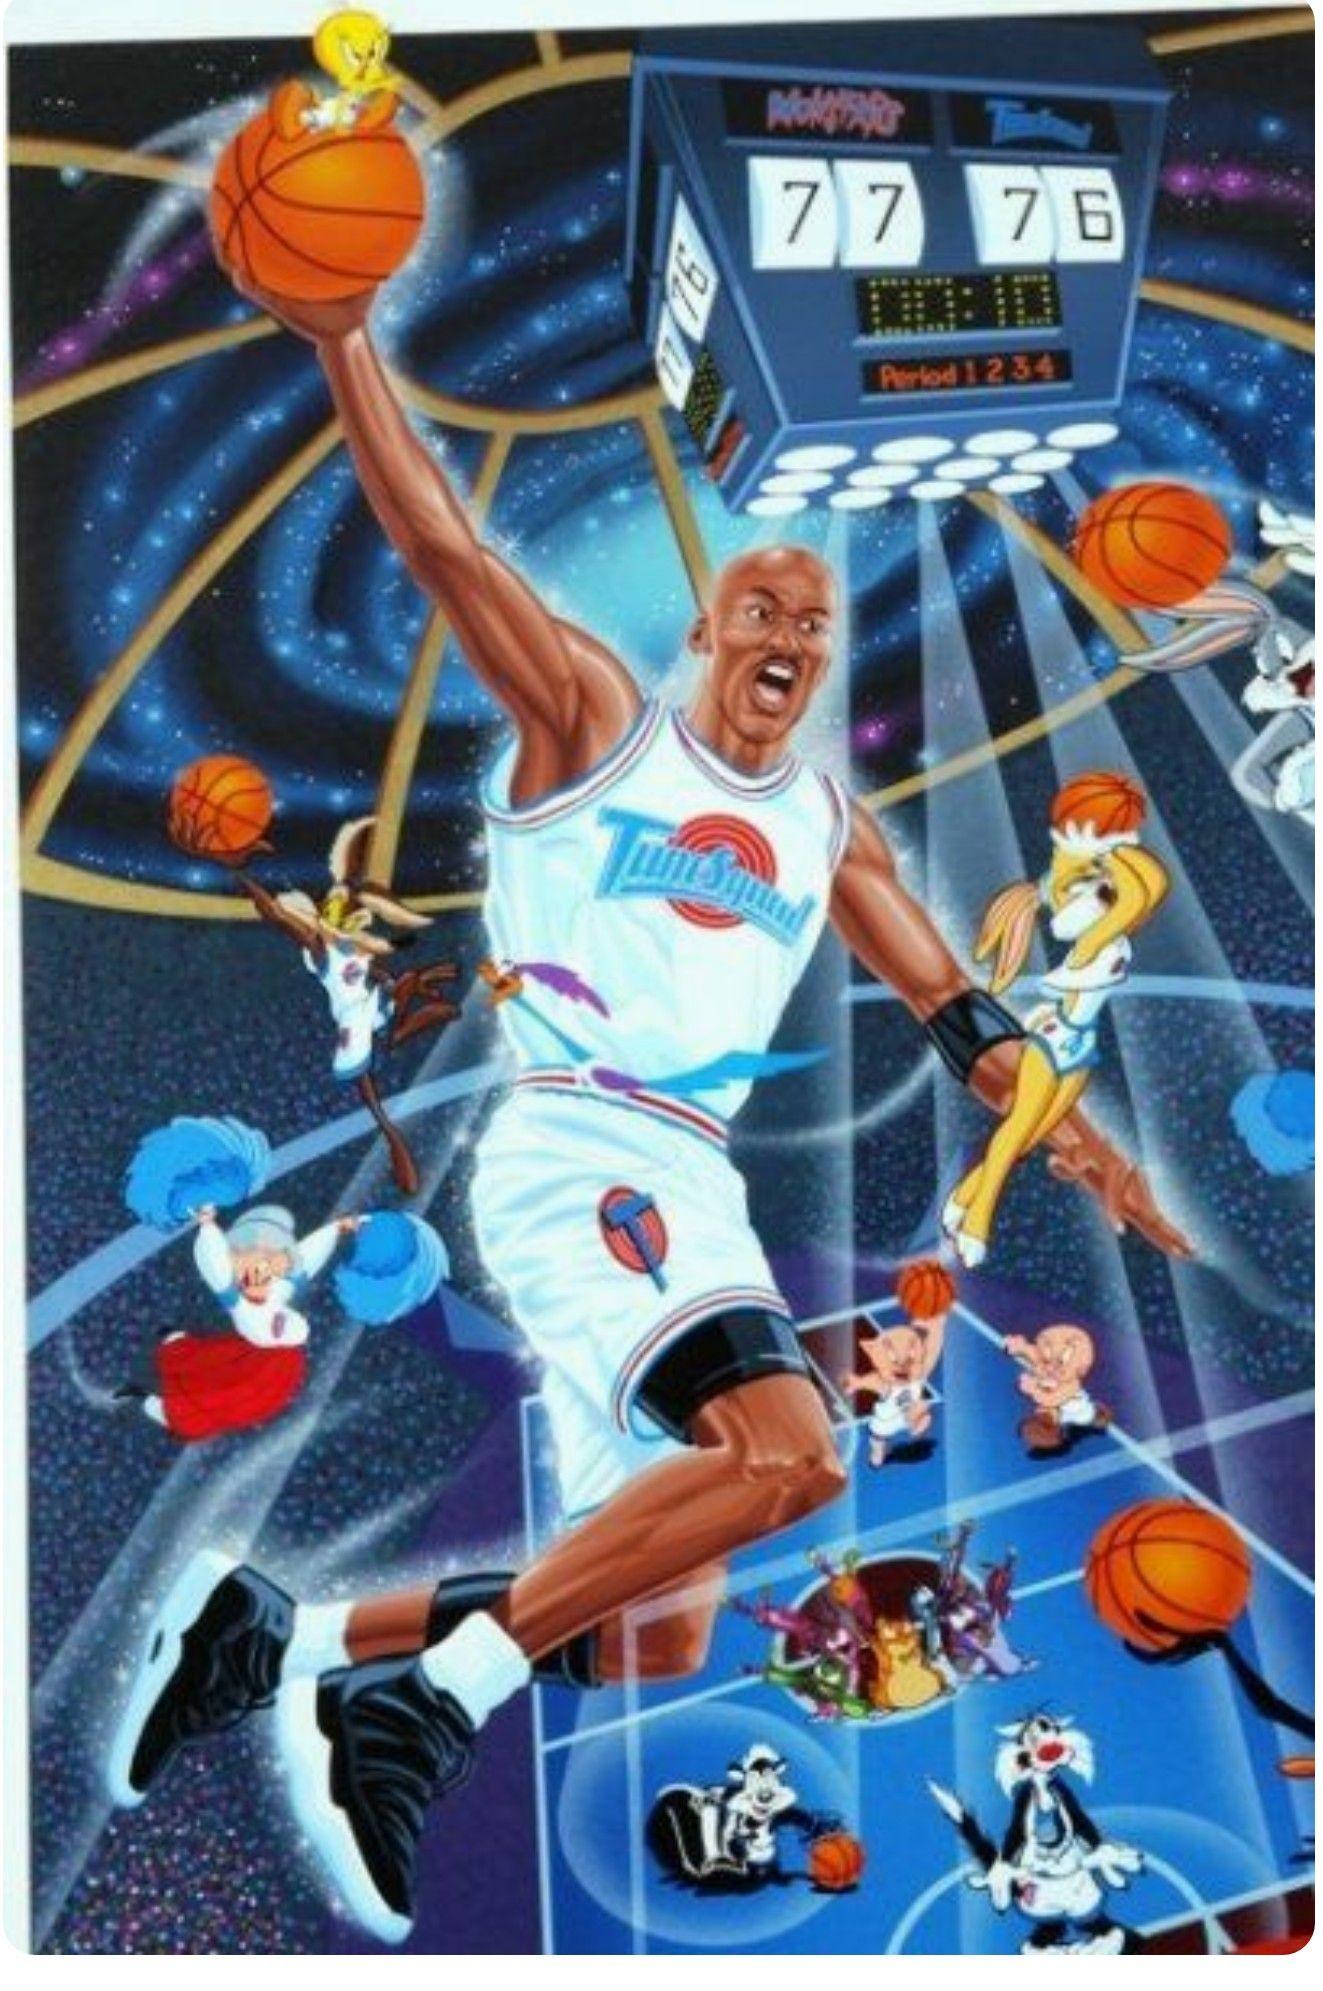 Michael Jordan Fondos De Pantalla Nike Dibujos De Basquetbol Jugadores De Baloncesto